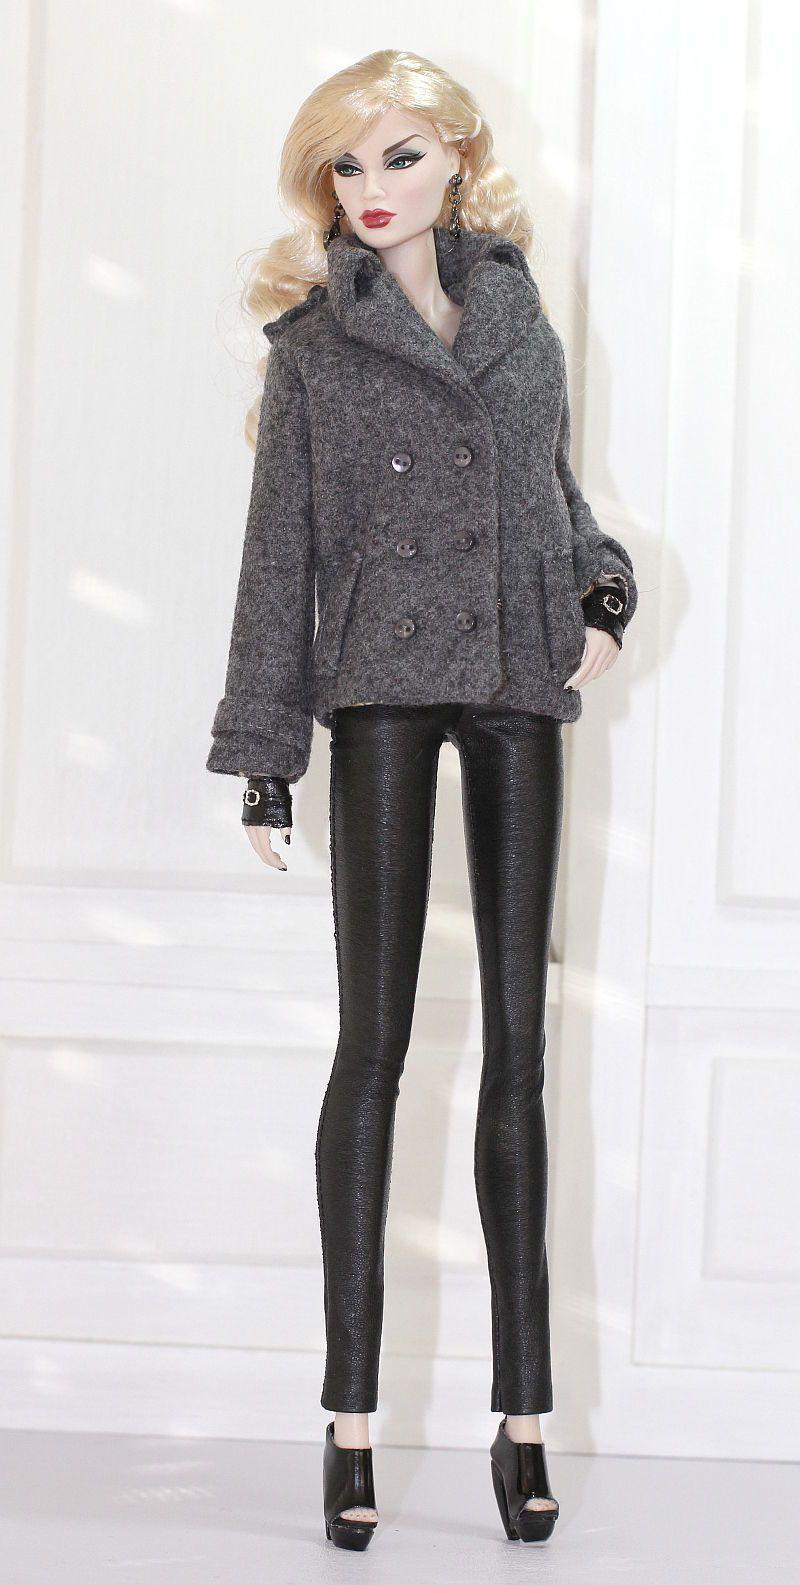 Pin von habilisdolls auf Doll fashion CREATORS that I LOVE ...